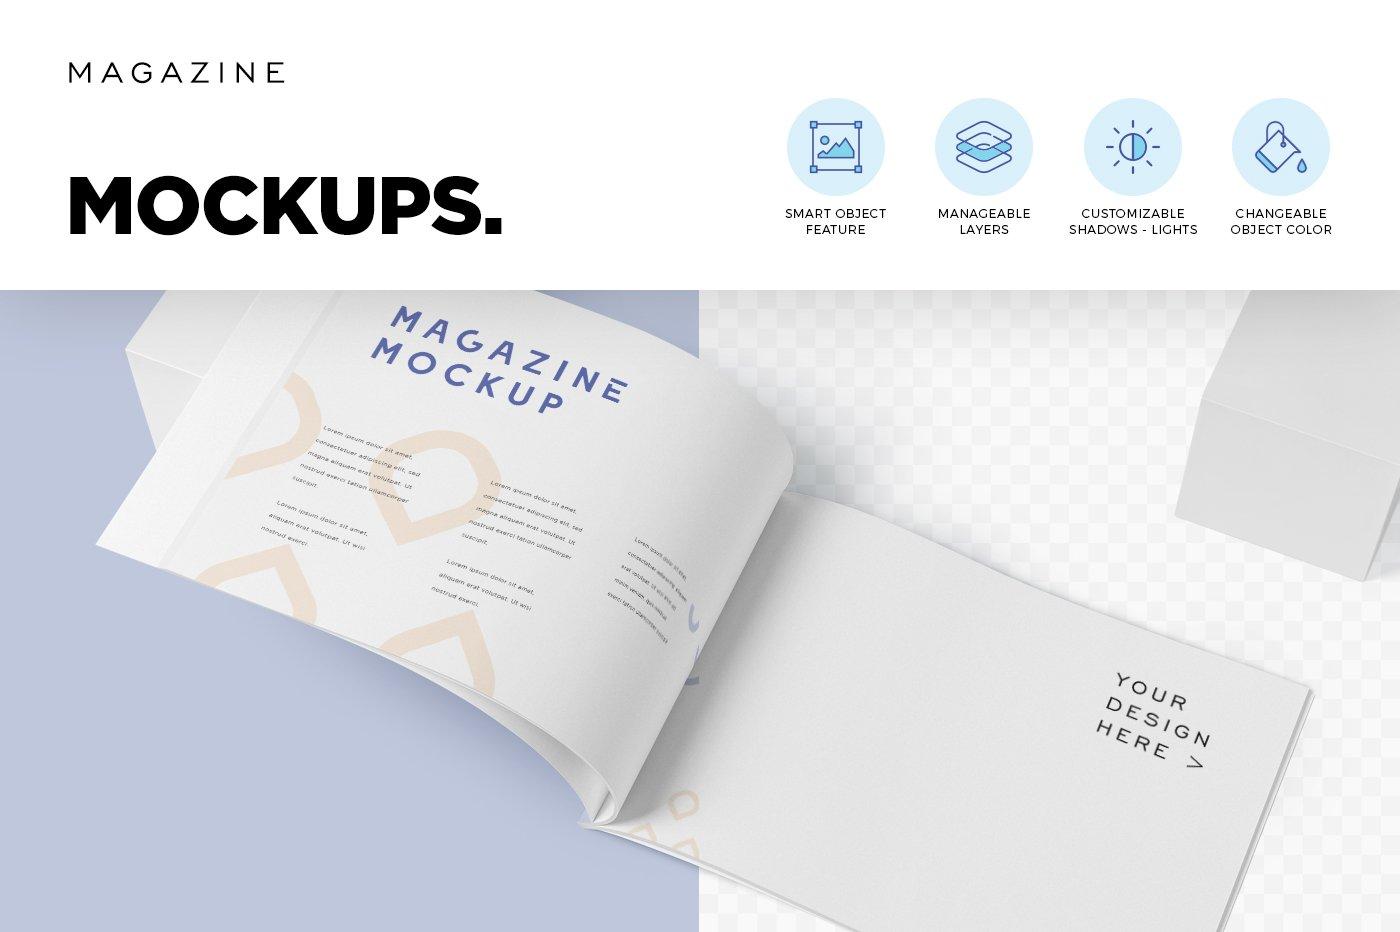 A4横版宣传画册设计展示样机 A4 Horizontal Brochure Mockups插图(5)